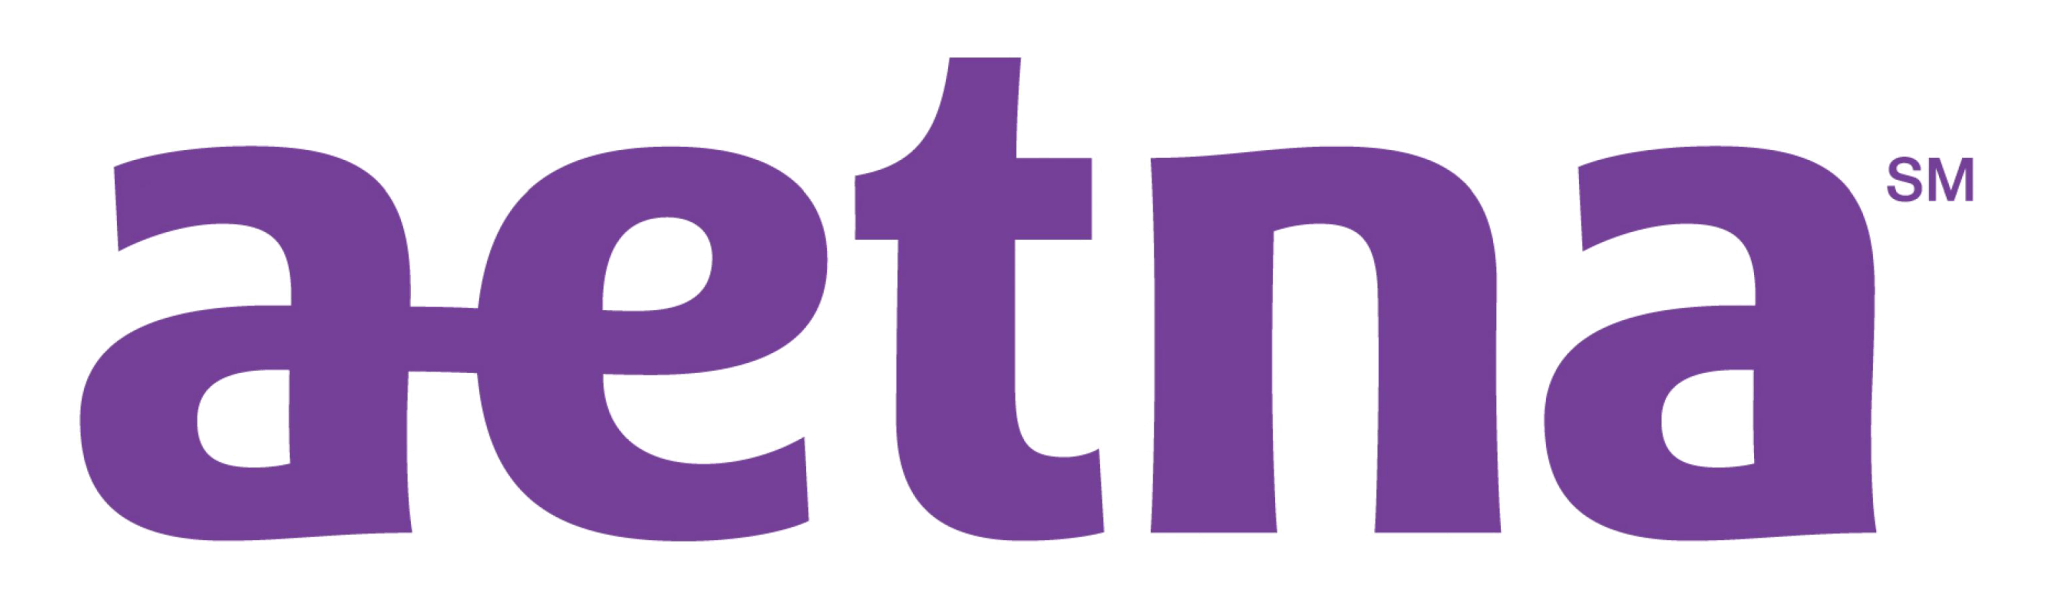 https://specializednj.com/wp-content/uploads/2021/01/PNGPIX-COM-Aetna-Logo-PNG-Transparent-2.png